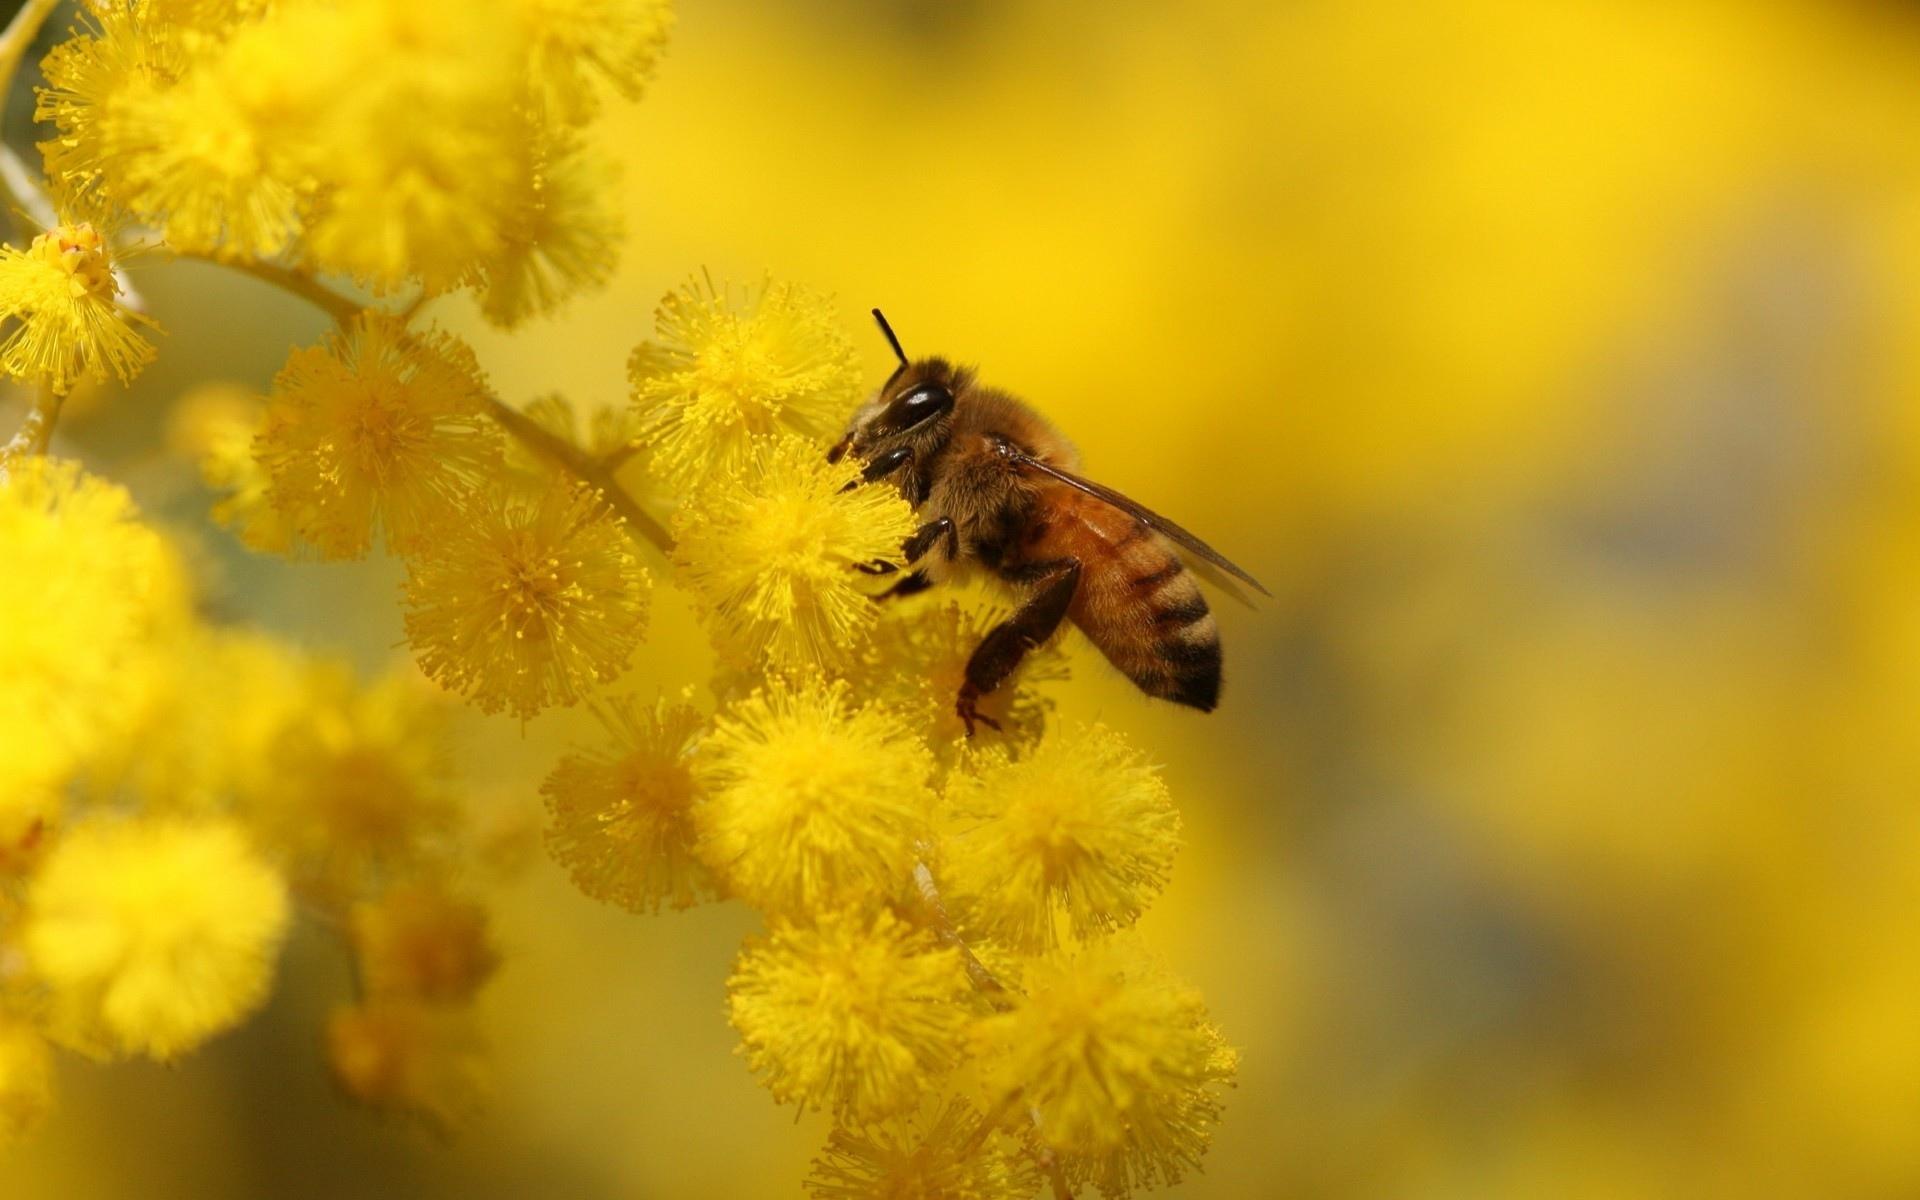 Bee Hd Wallpaper Background Image 1920x1200 Id